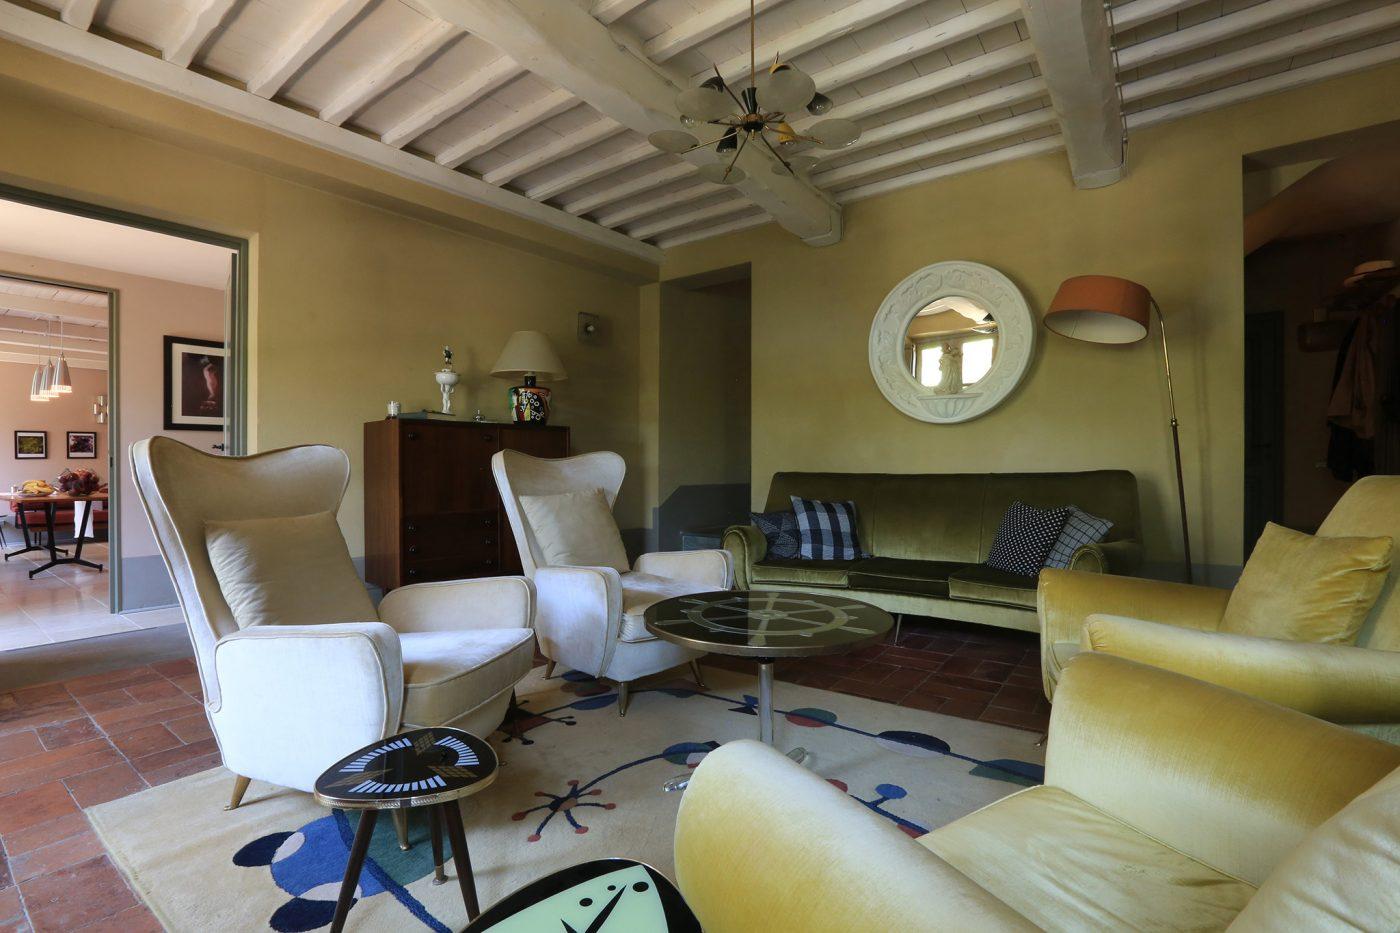 toscana locanda al colle cool spots. Black Bedroom Furniture Sets. Home Design Ideas